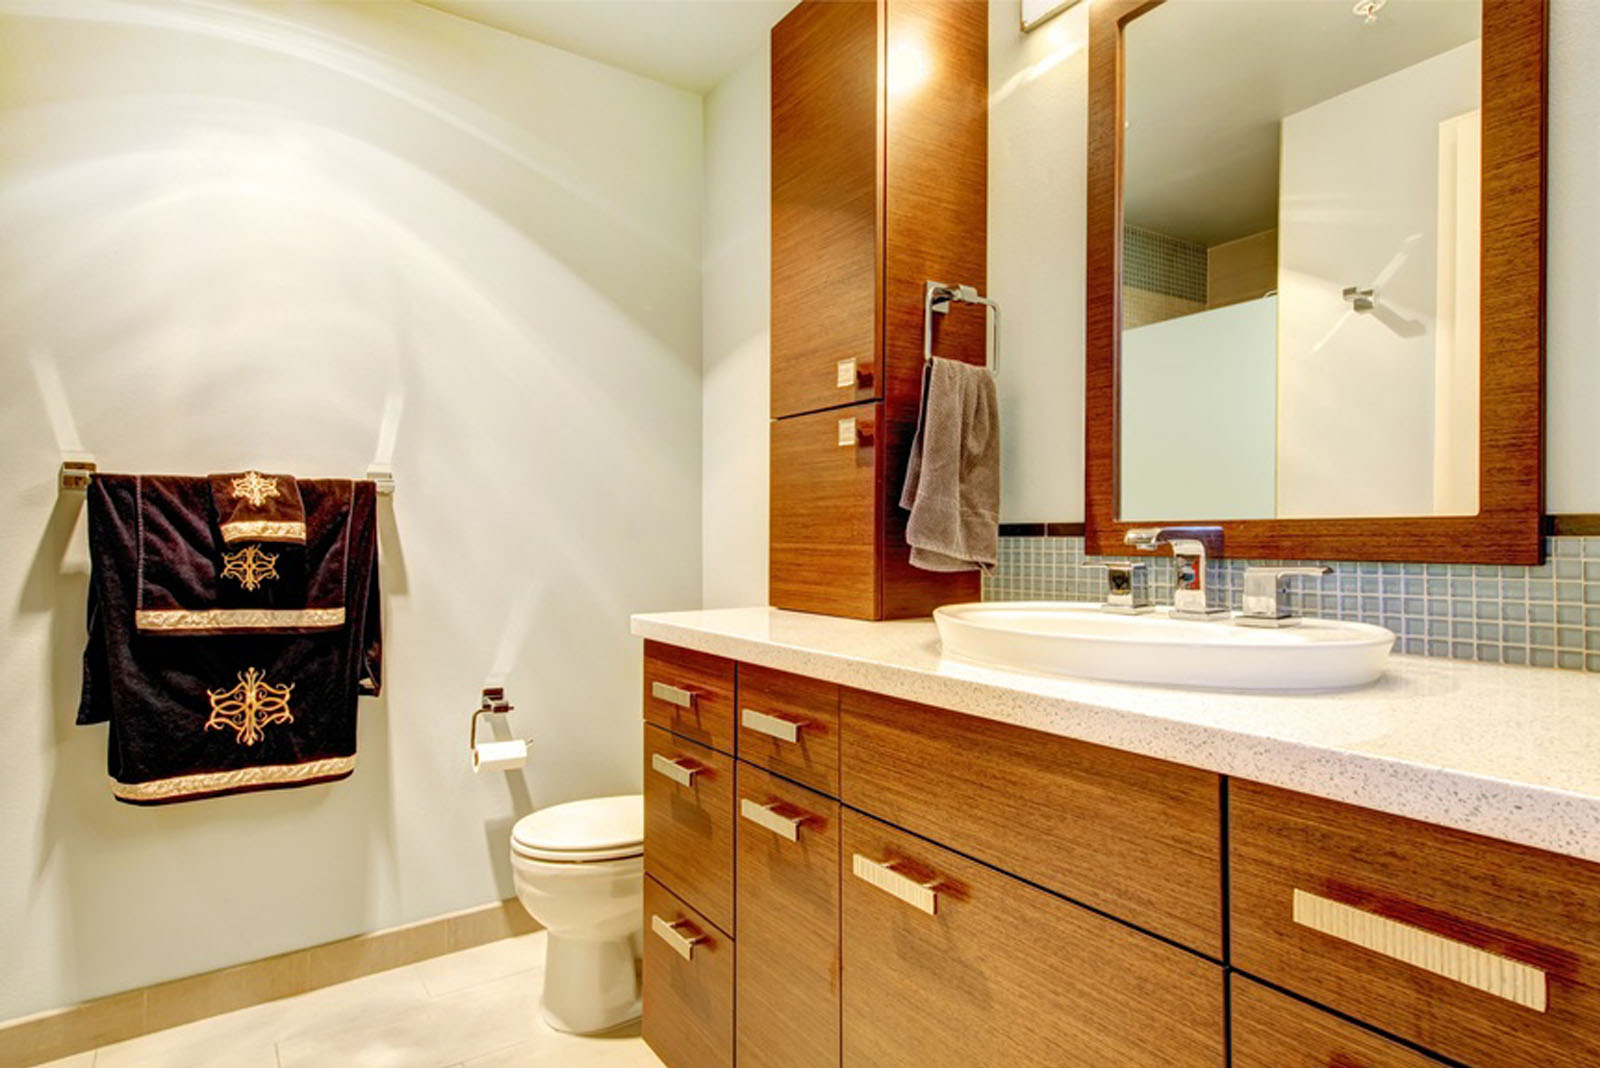 Bathroom design Kincir Bali WP 1